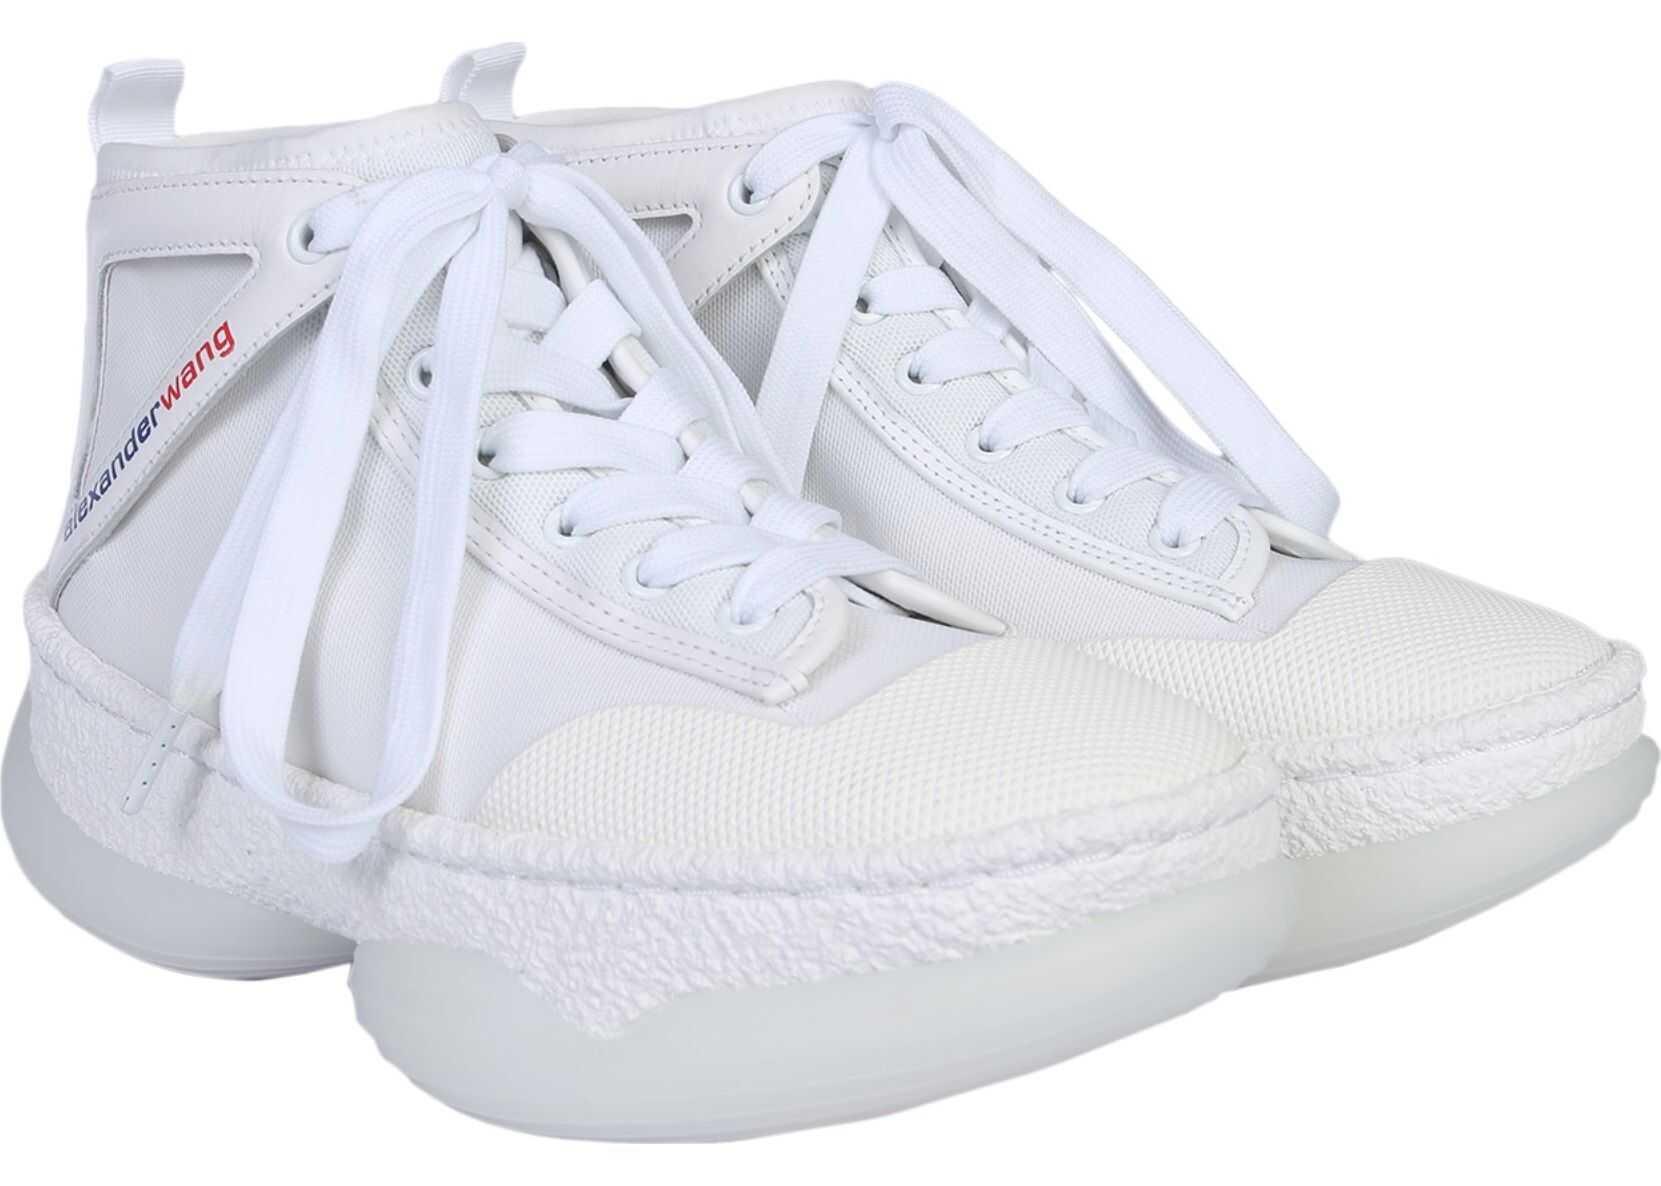 Alexander Wang A1 High Sneakers WHITE